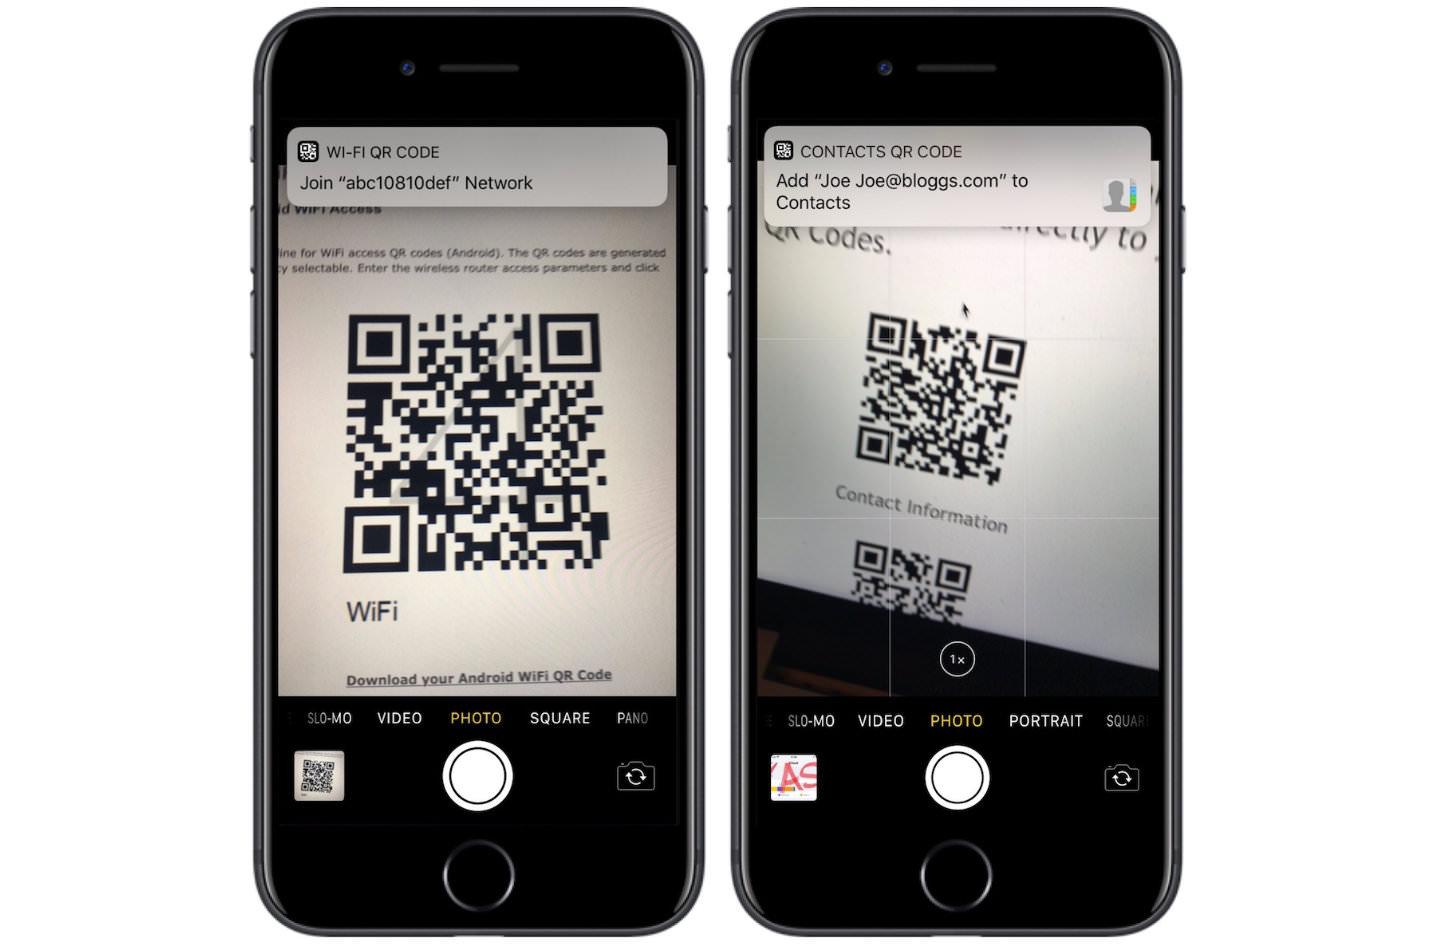 QR Code Reader in iOS11